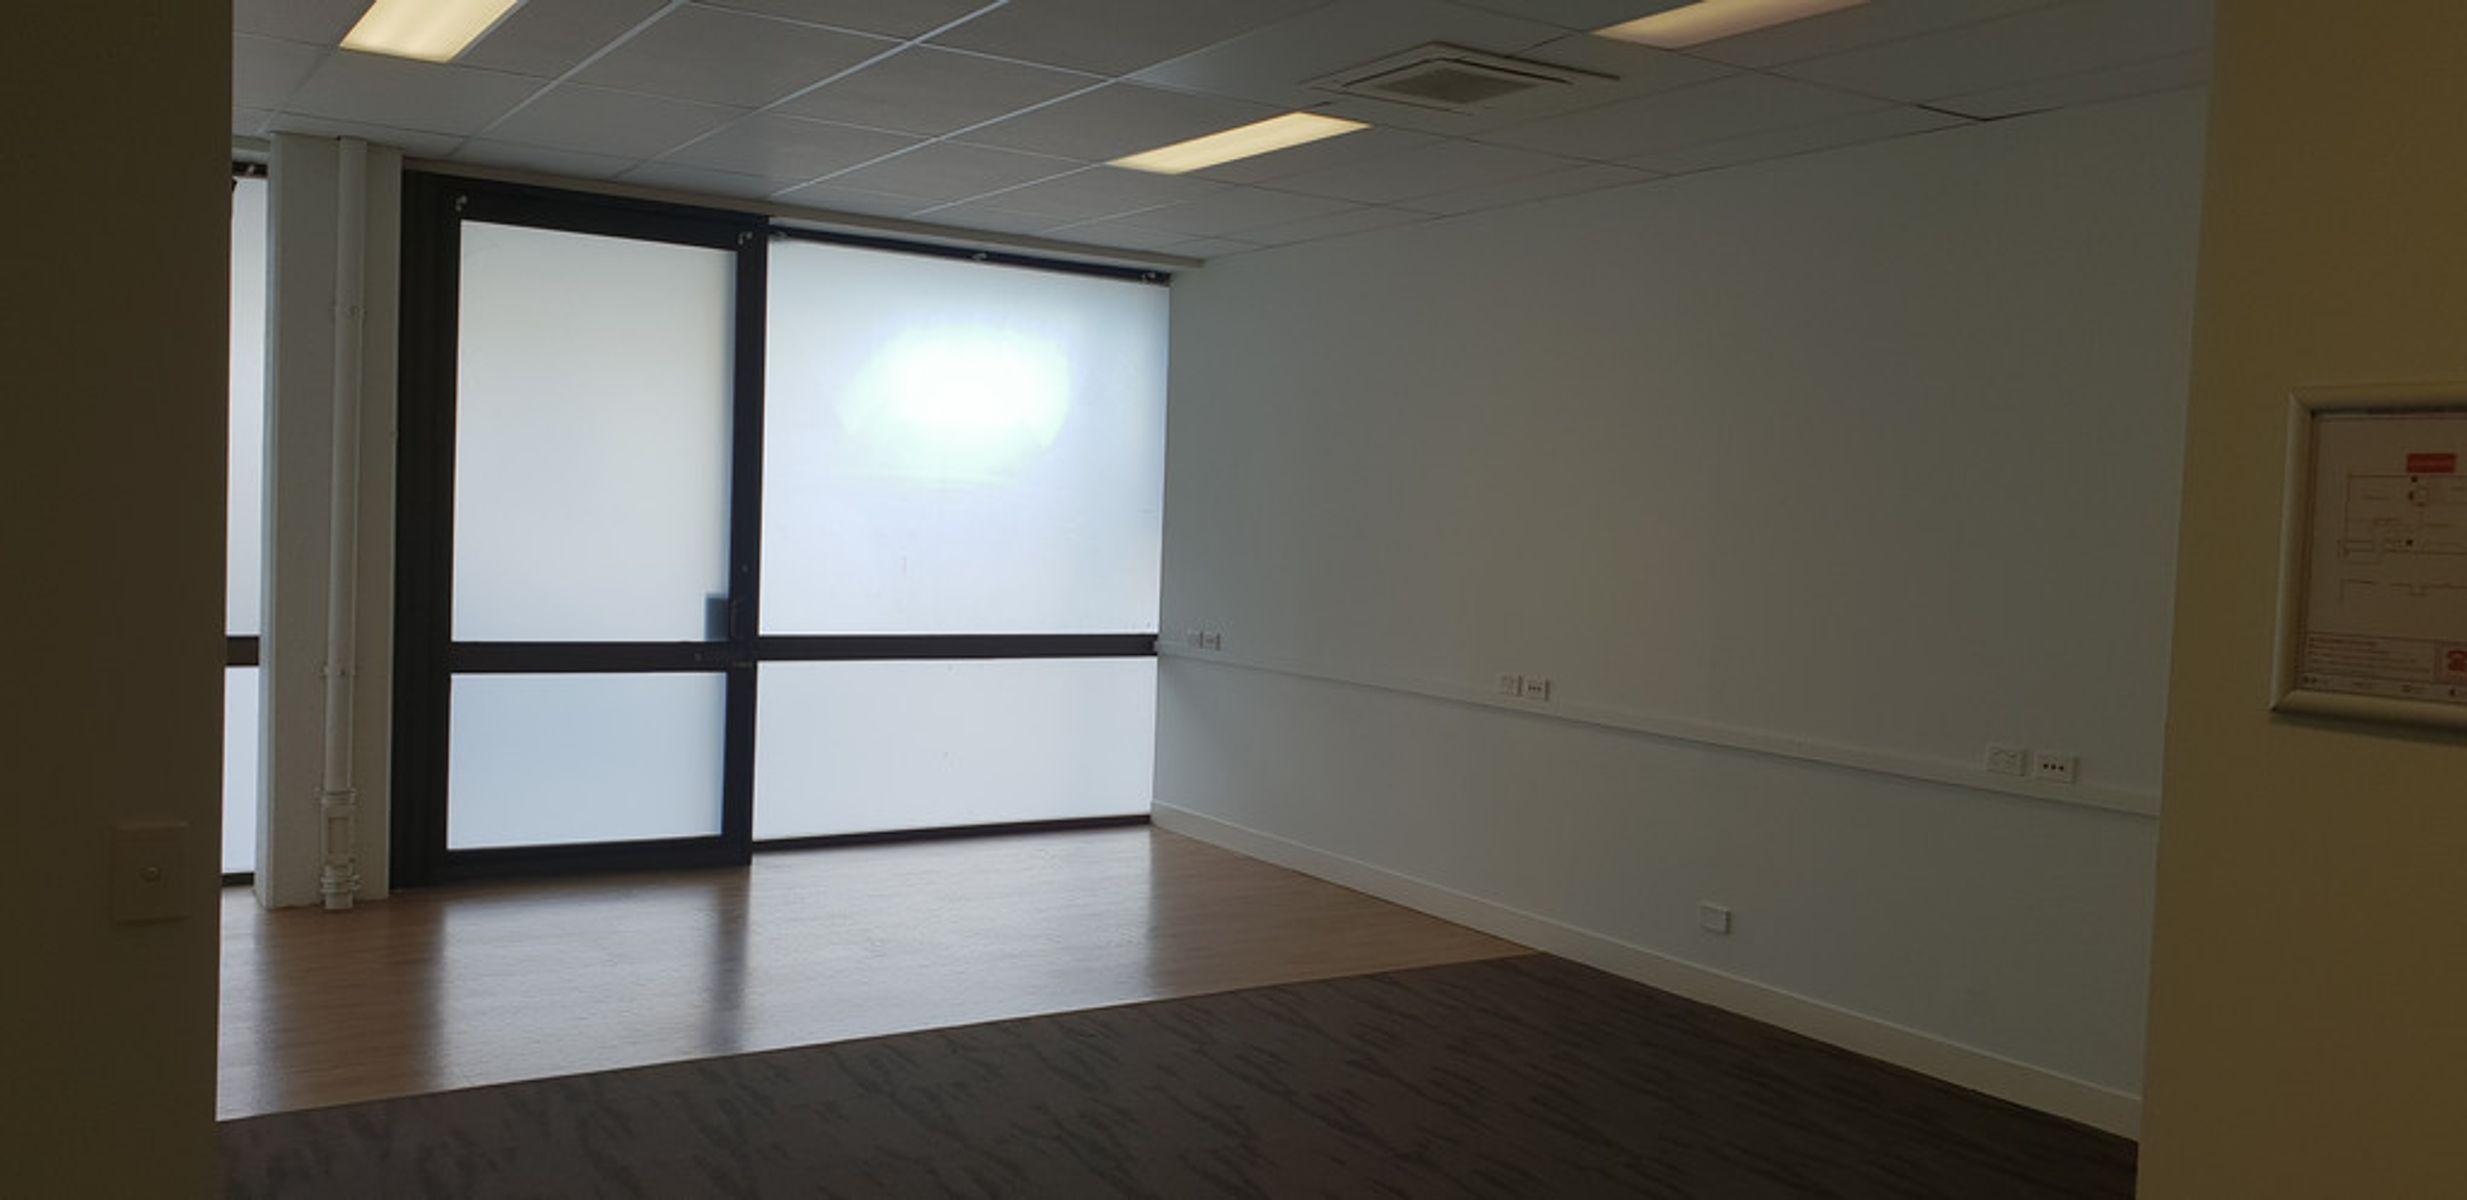 3,4&8, 78 Brisbane Street, Ipswich, QLD 4305